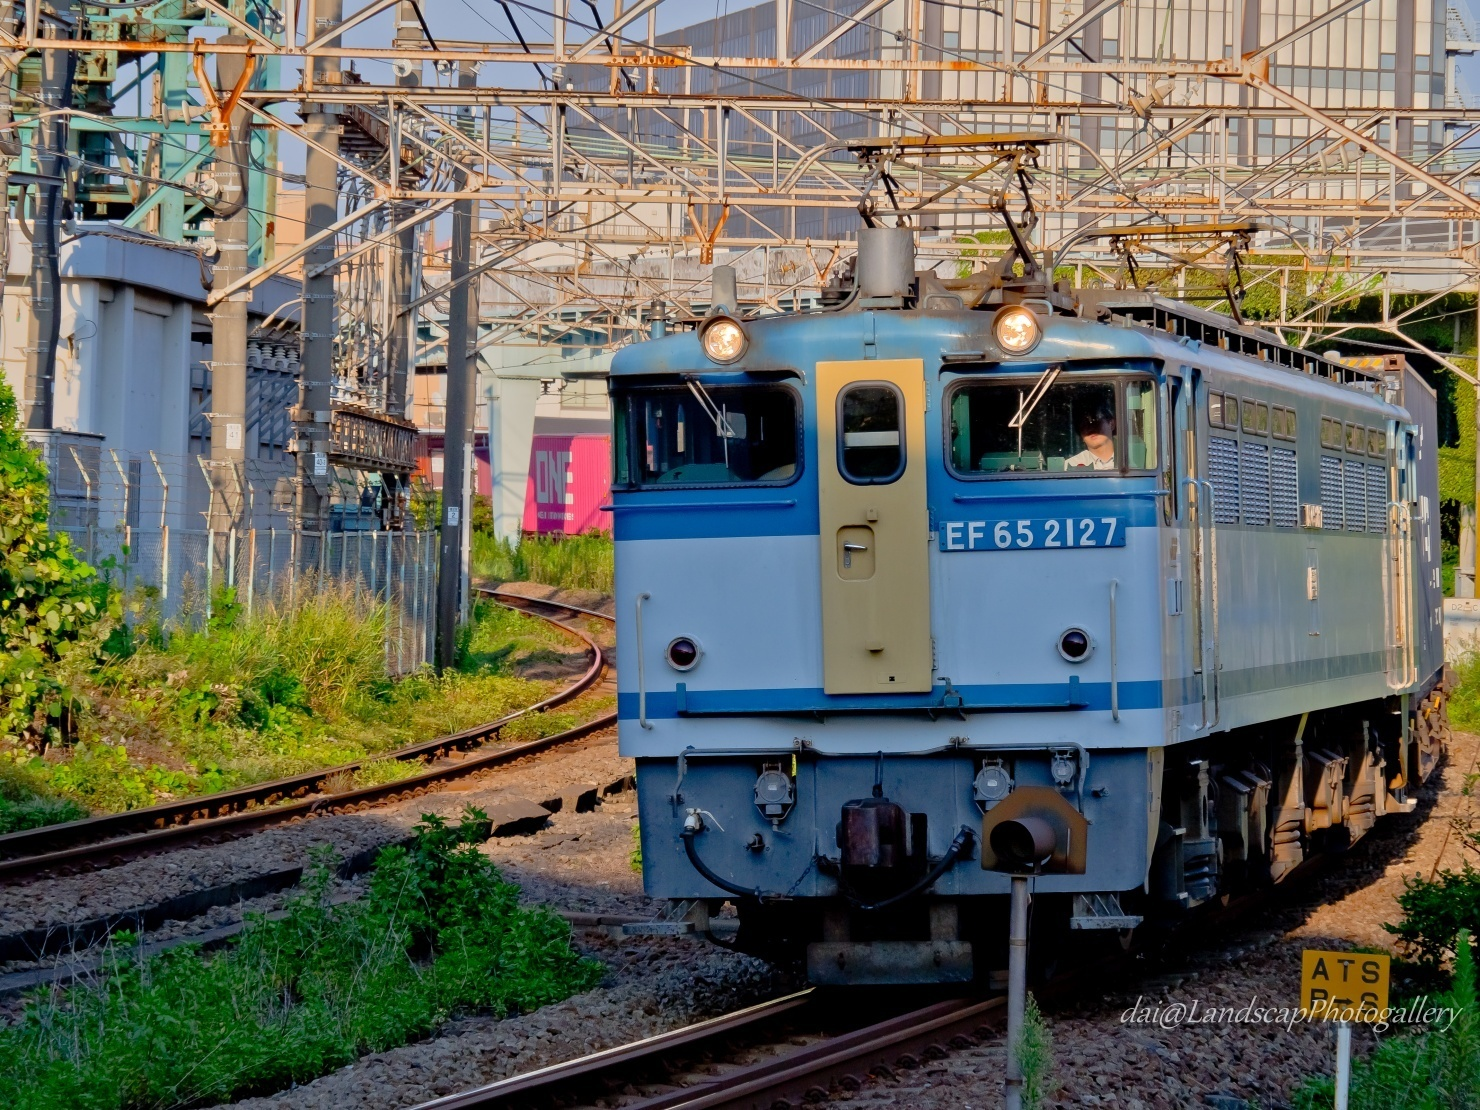 EF65 2127 海上コンテナ貨物列車